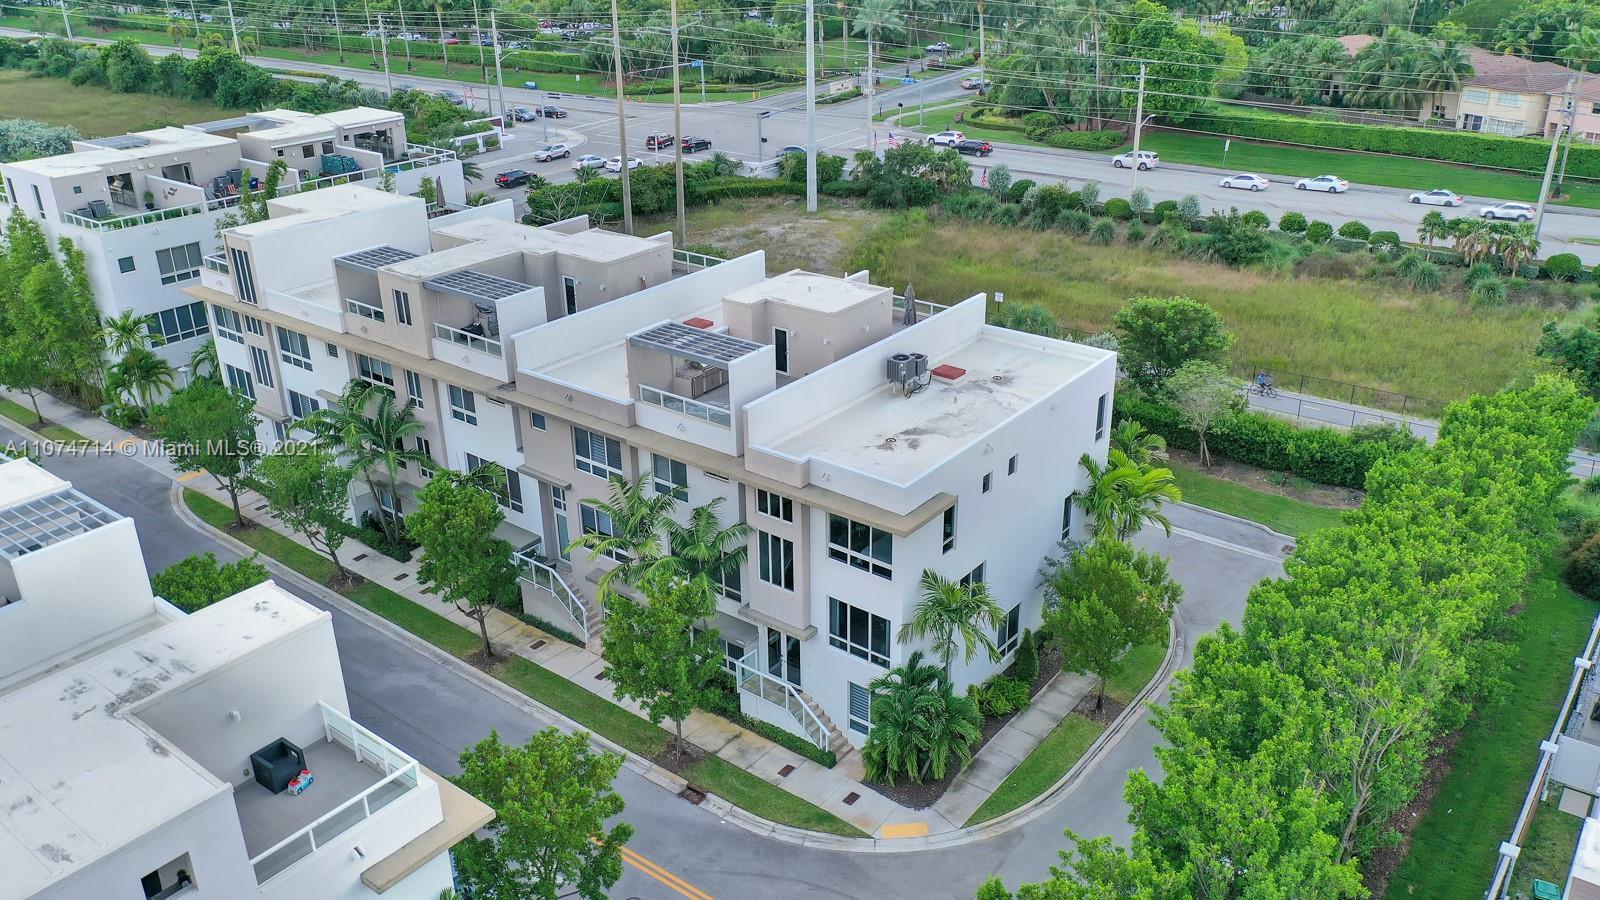 Landmark At Doral - 6670 NW 105th Ct, Doral, FL 33178